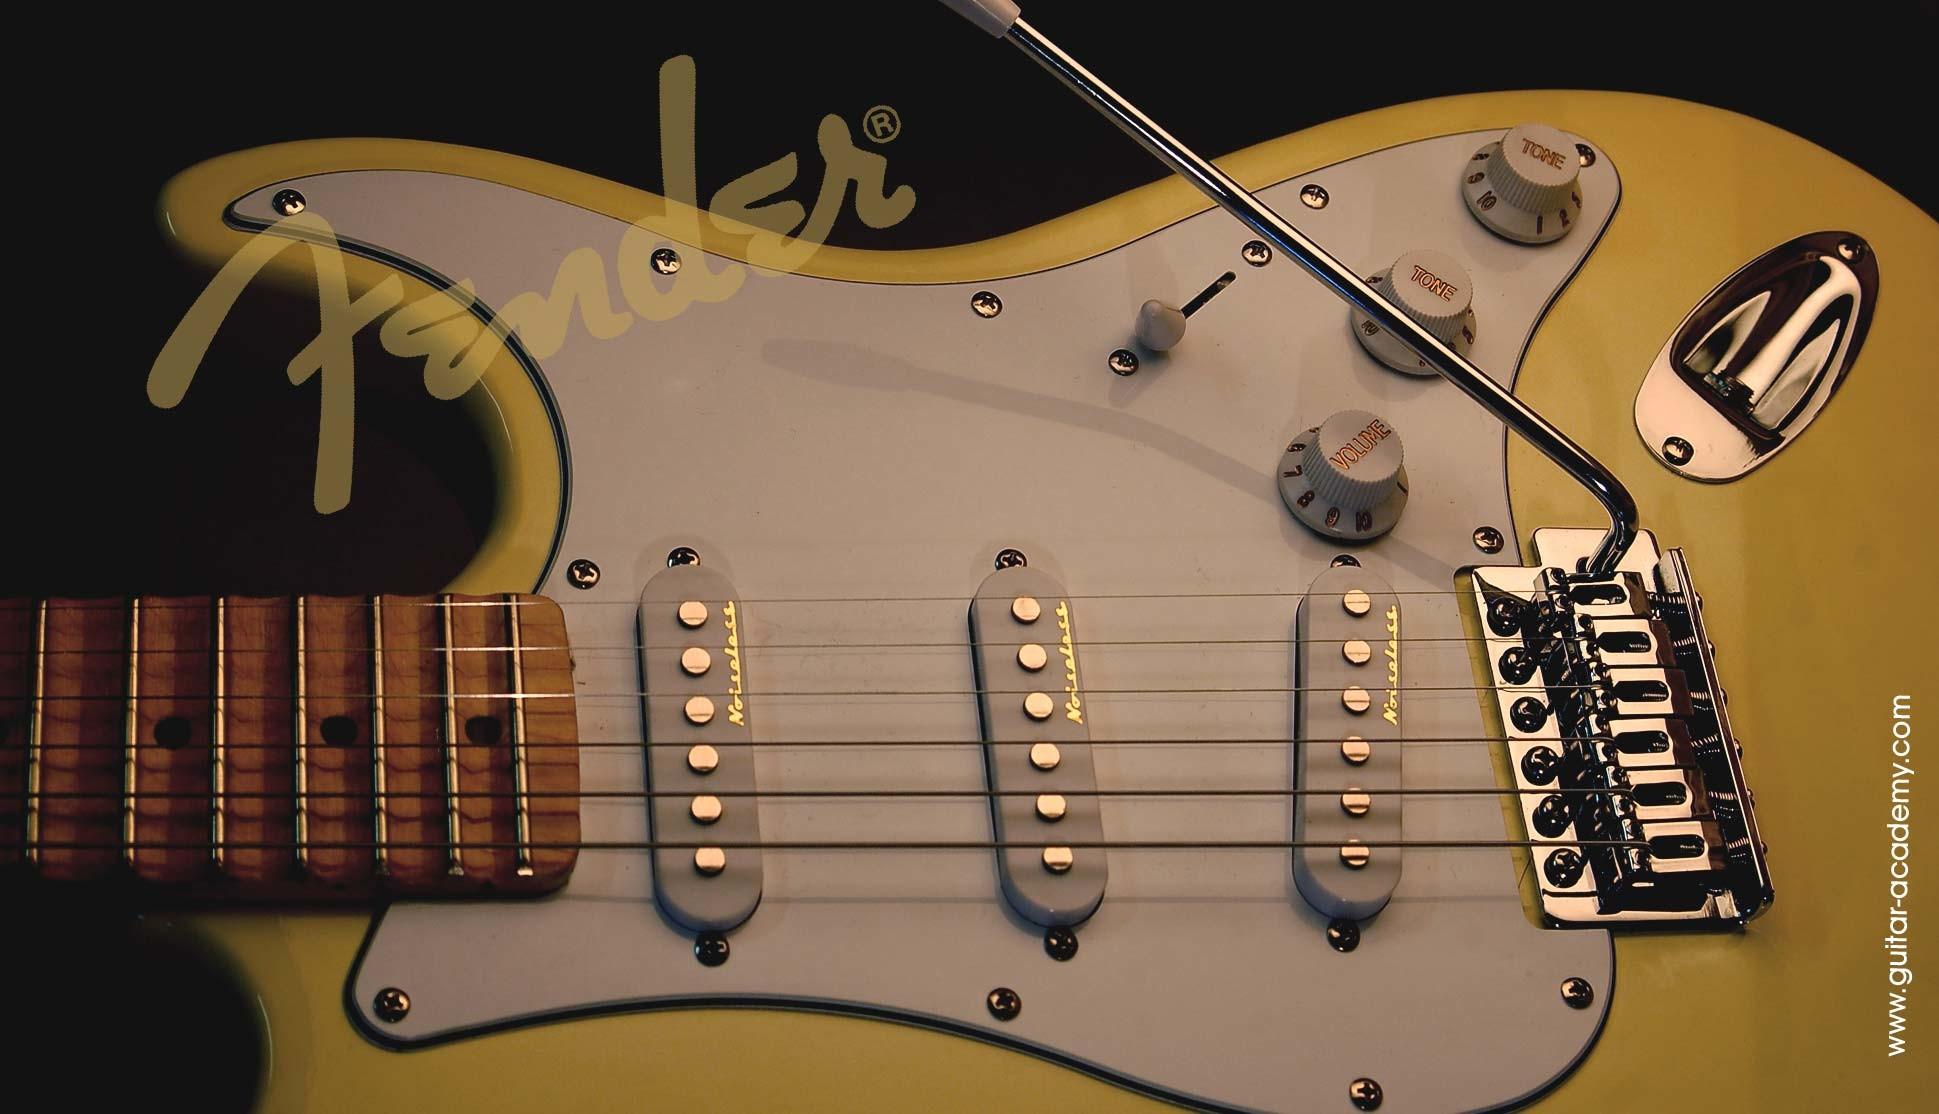 Guitar wallpaper, Fender Stratocaster guitar